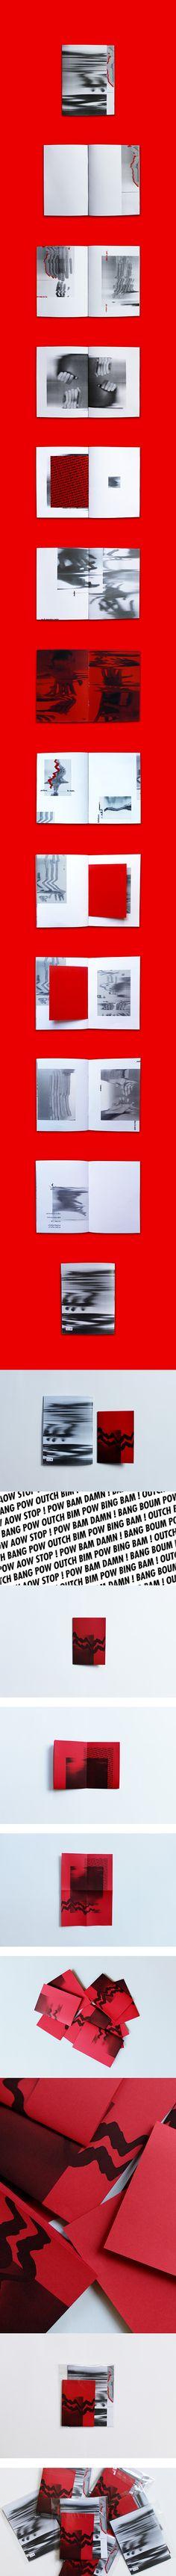 Style fanzine - Jeu de mains